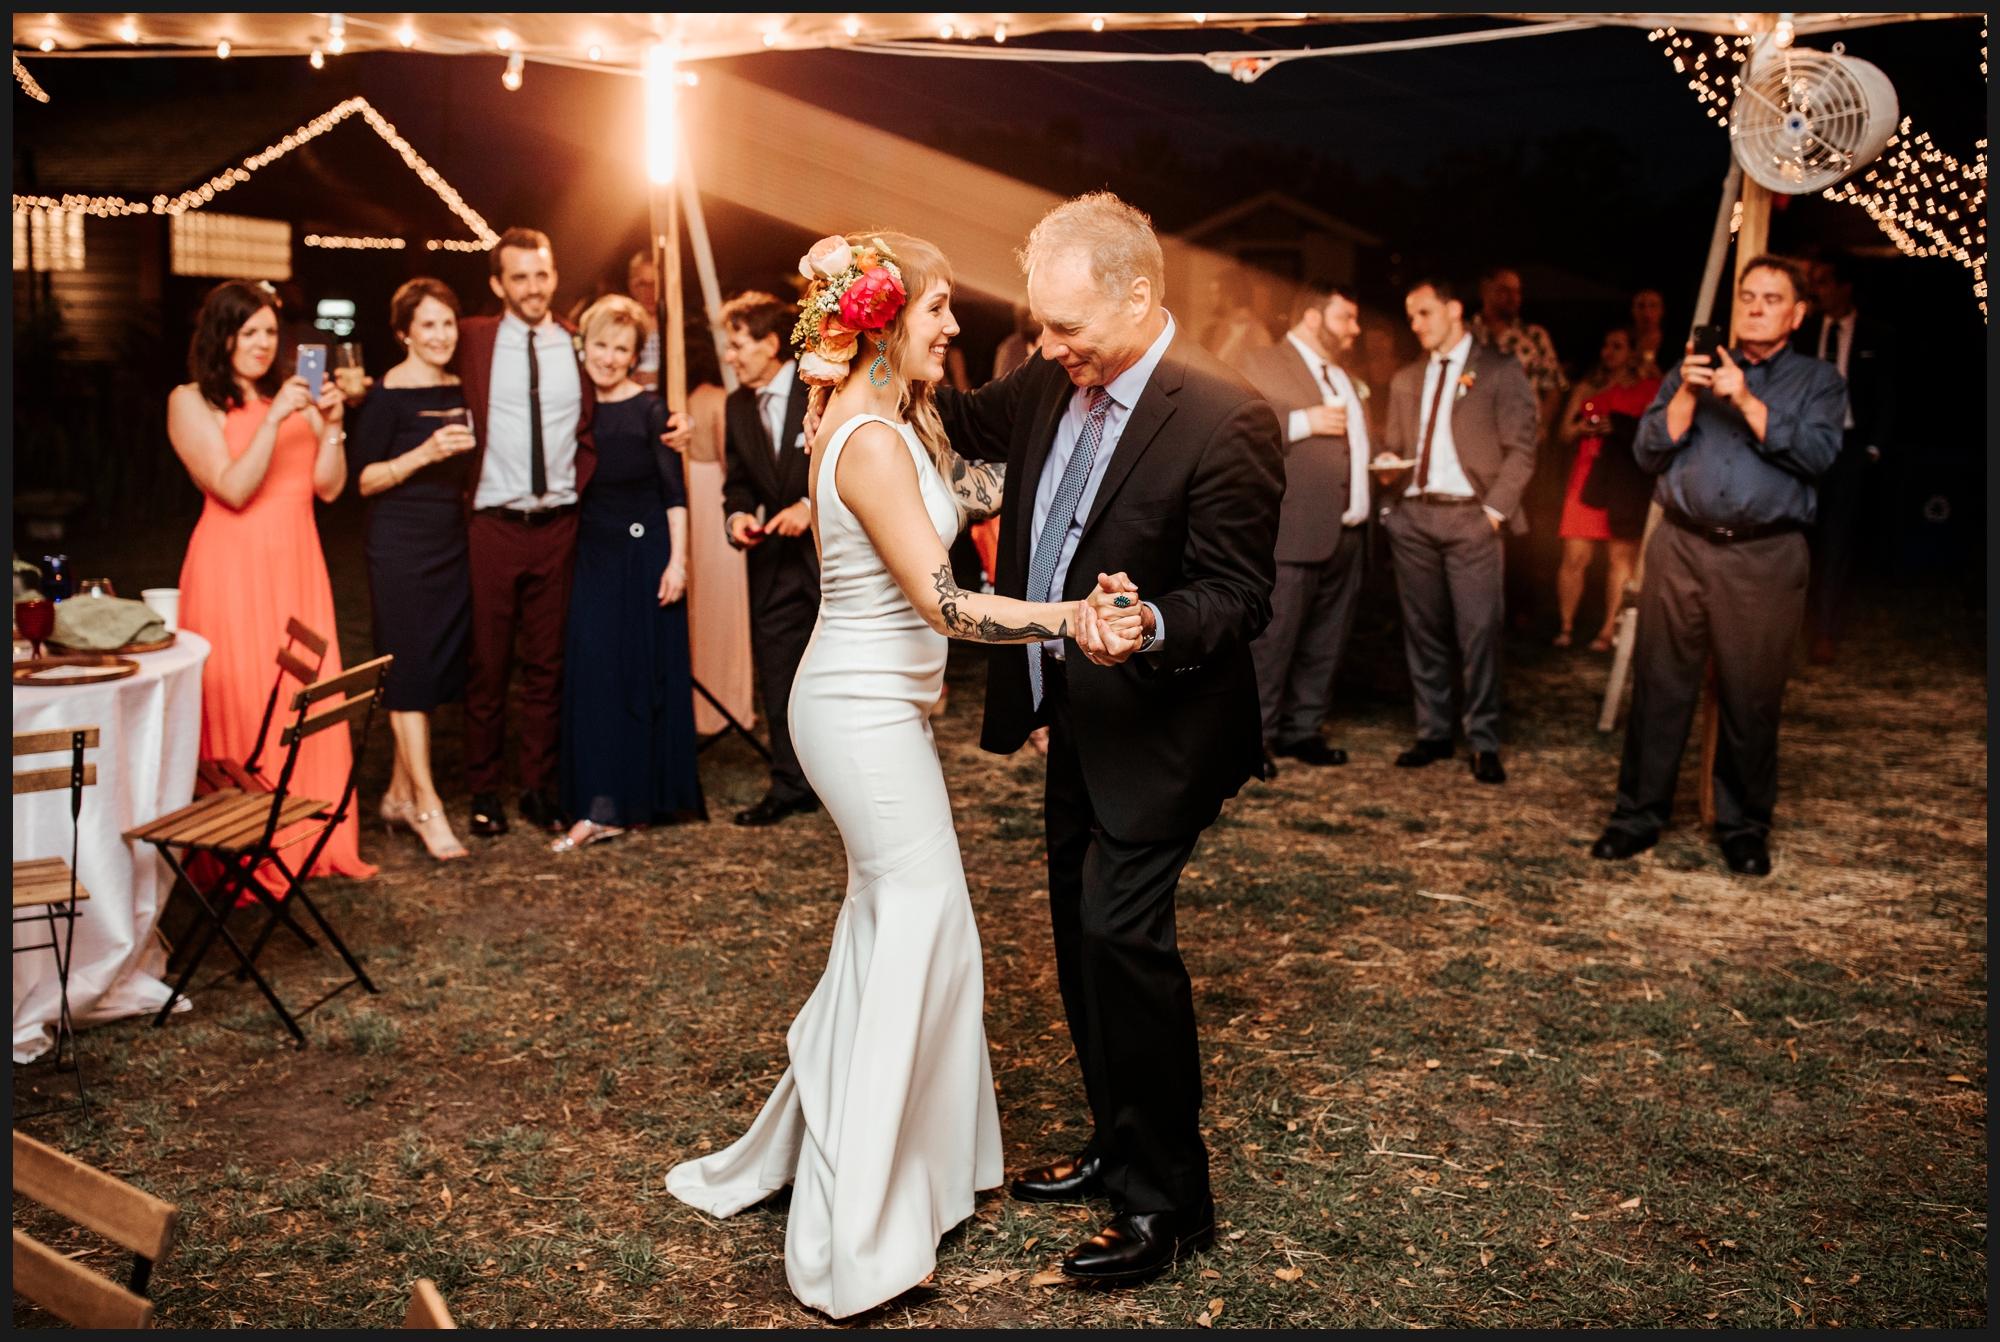 Orlando-Wedding-Photographer-destination-wedding-photographer-florida-wedding-photographer-bohemian-wedding-photographer_2045.jpg